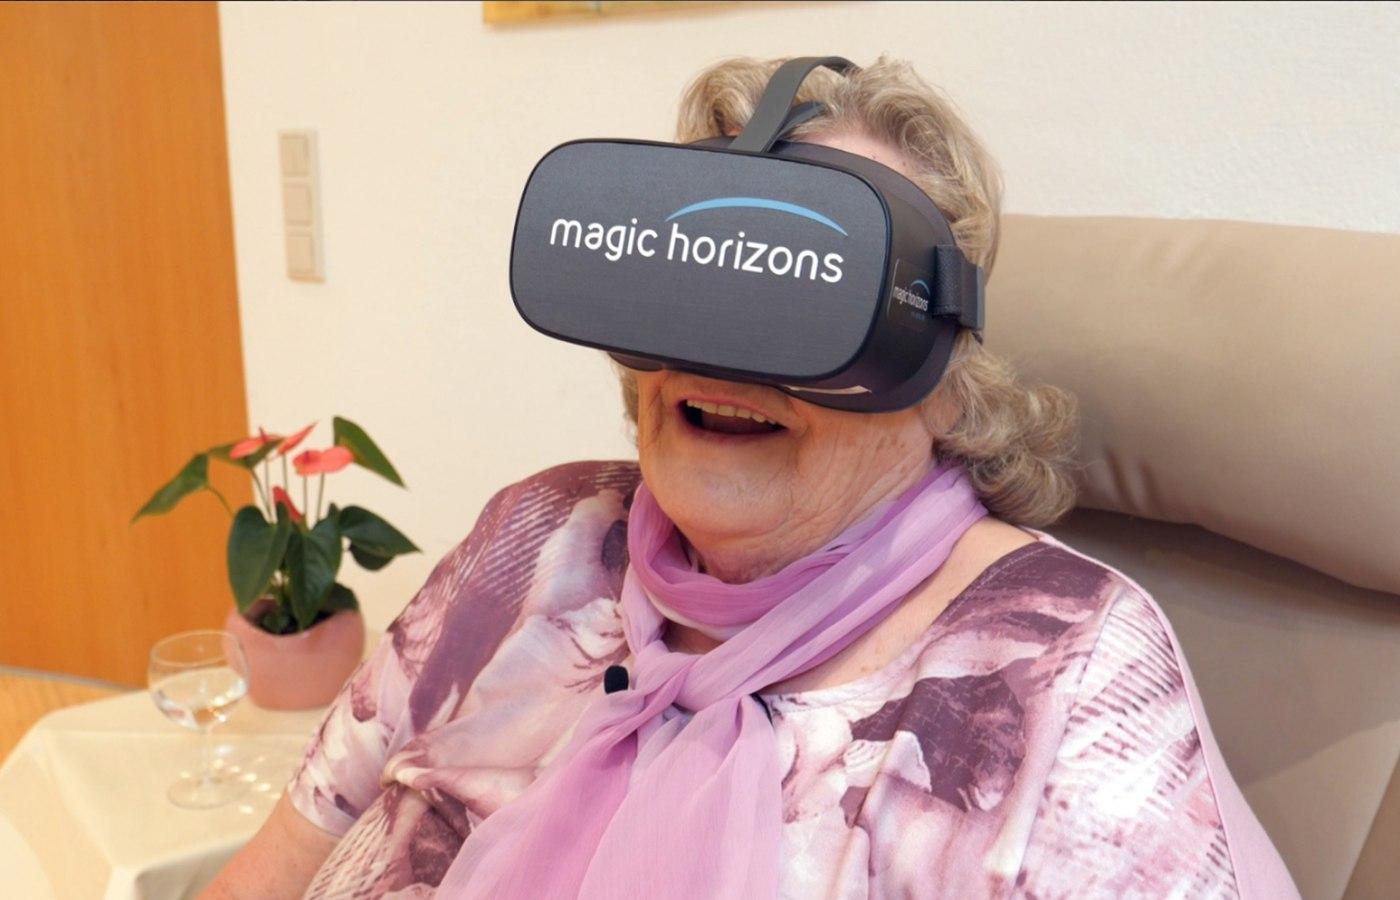 VR-Brille, © macic horizons